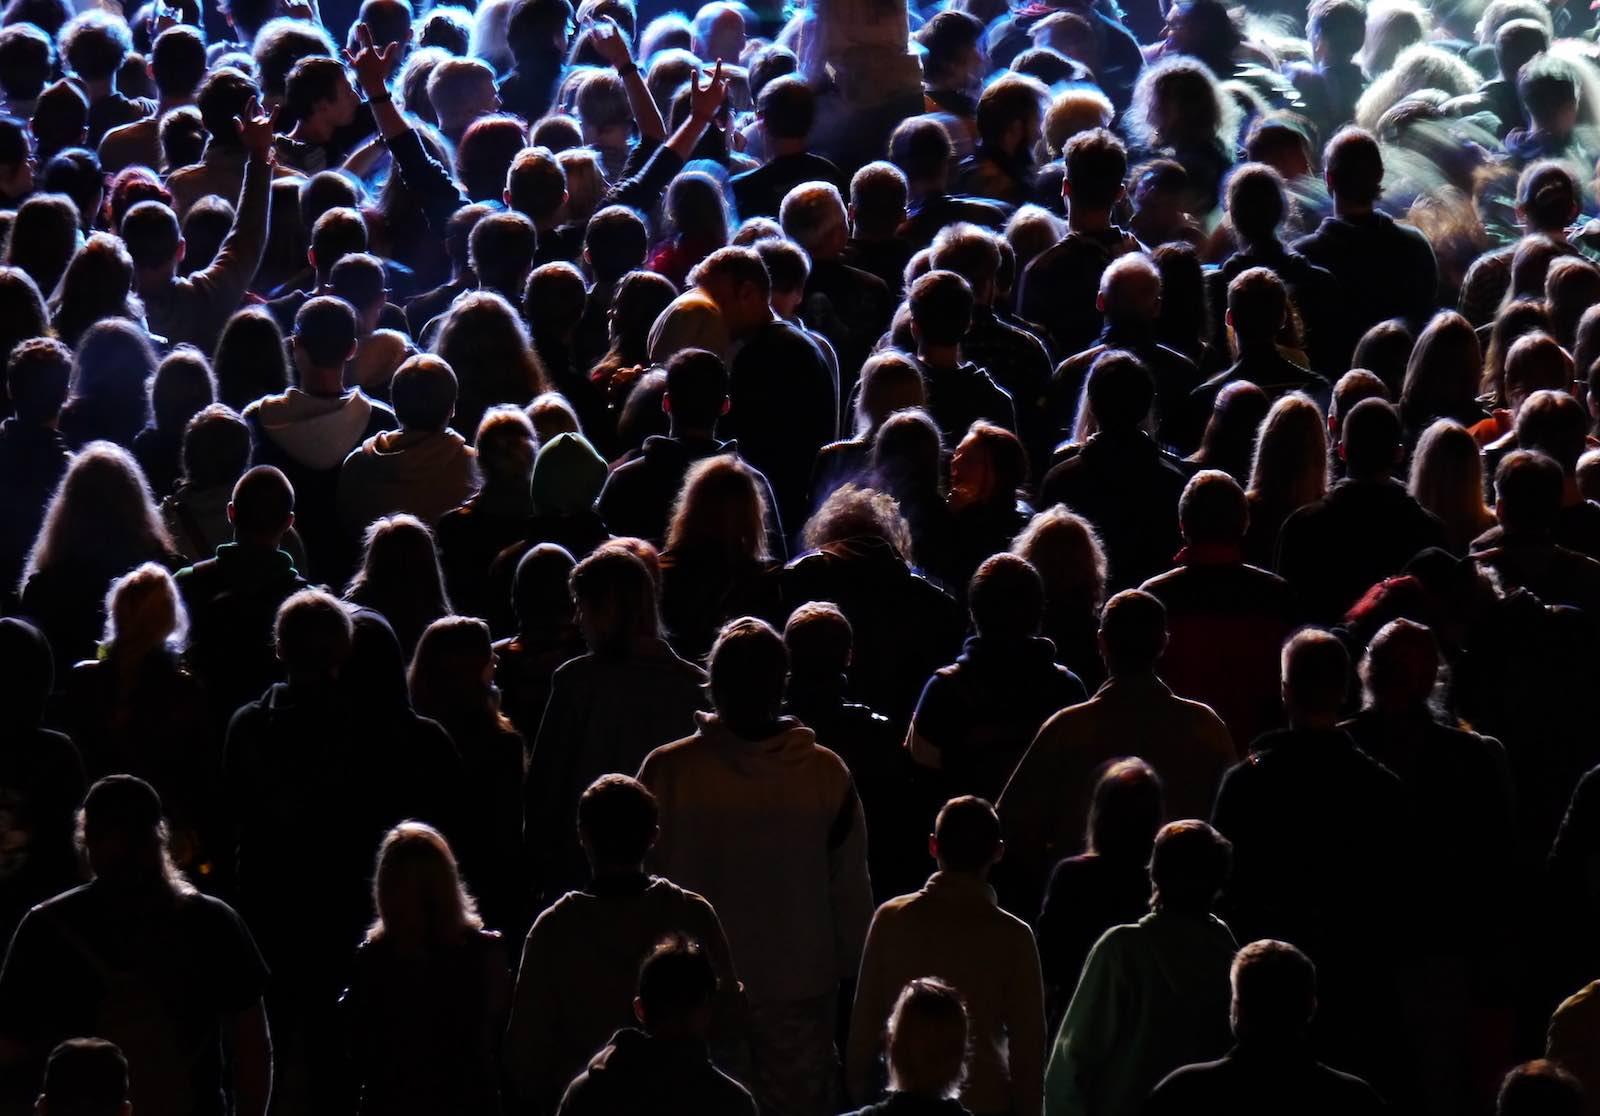 Tens of thousands in Australia live in the shadows of illegality (Photo: Zoi Koraki/Flickr)